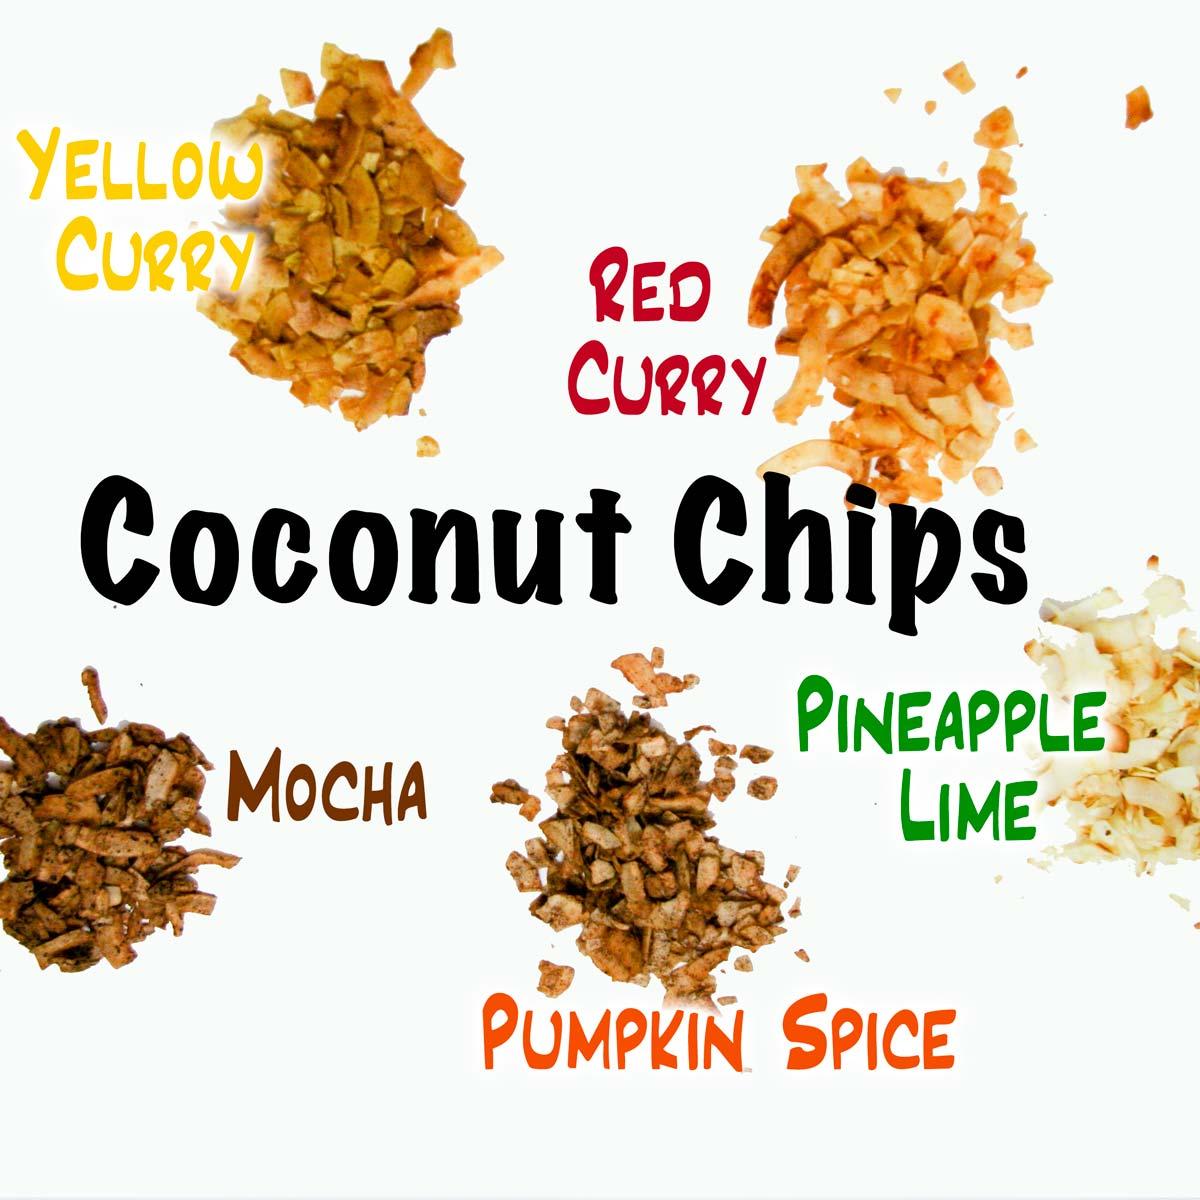 Coconut Chips 5 Ways: Quick, Easy, Healthy Snacks